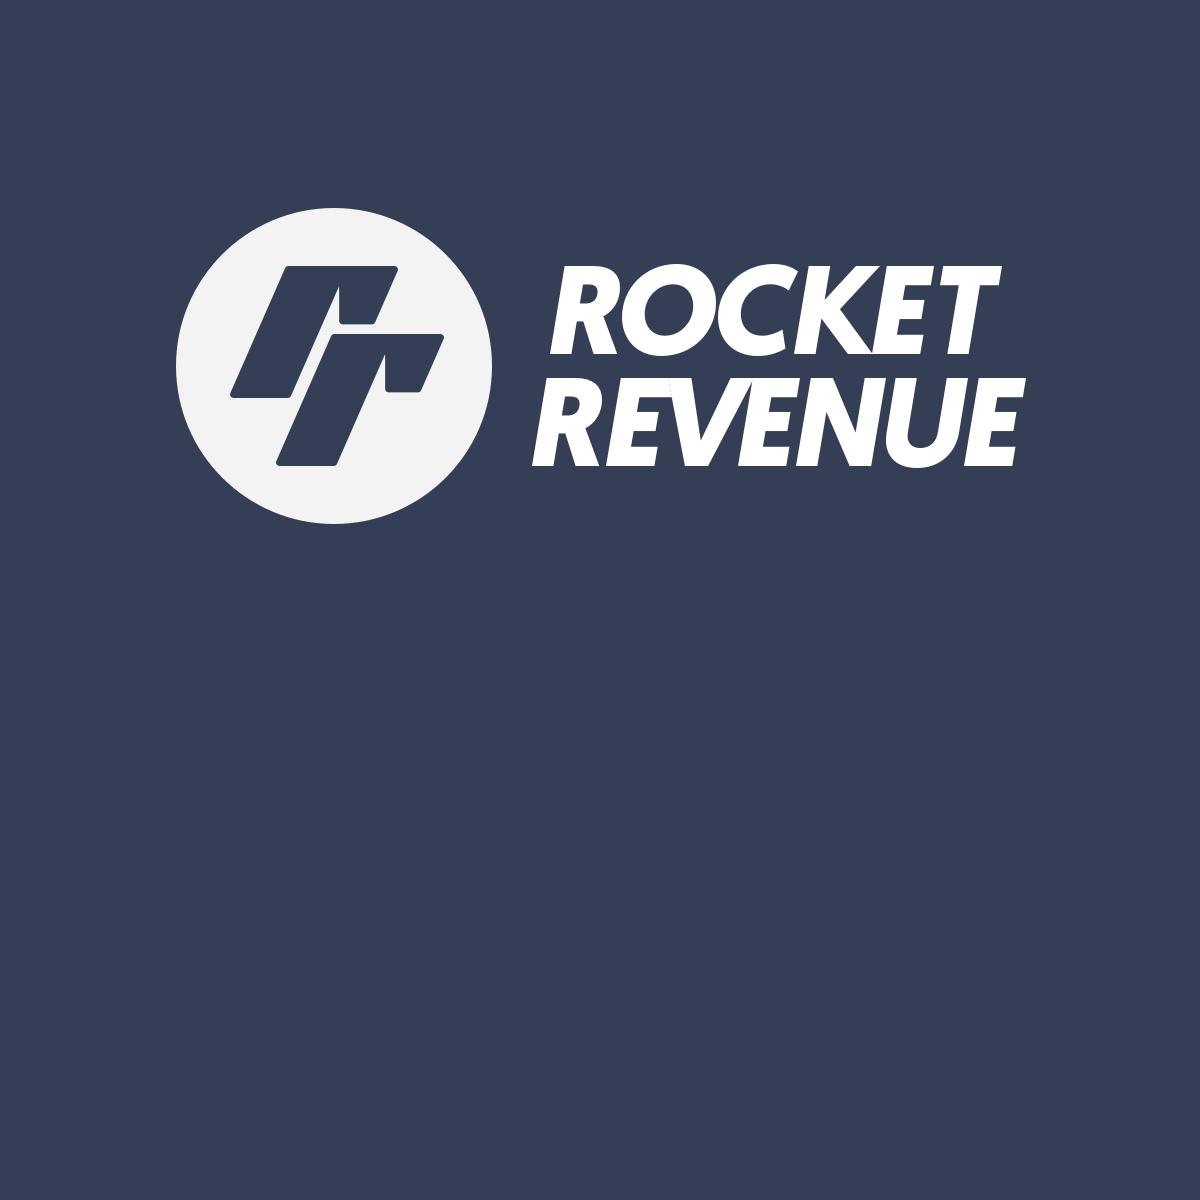 Rocket Revenue